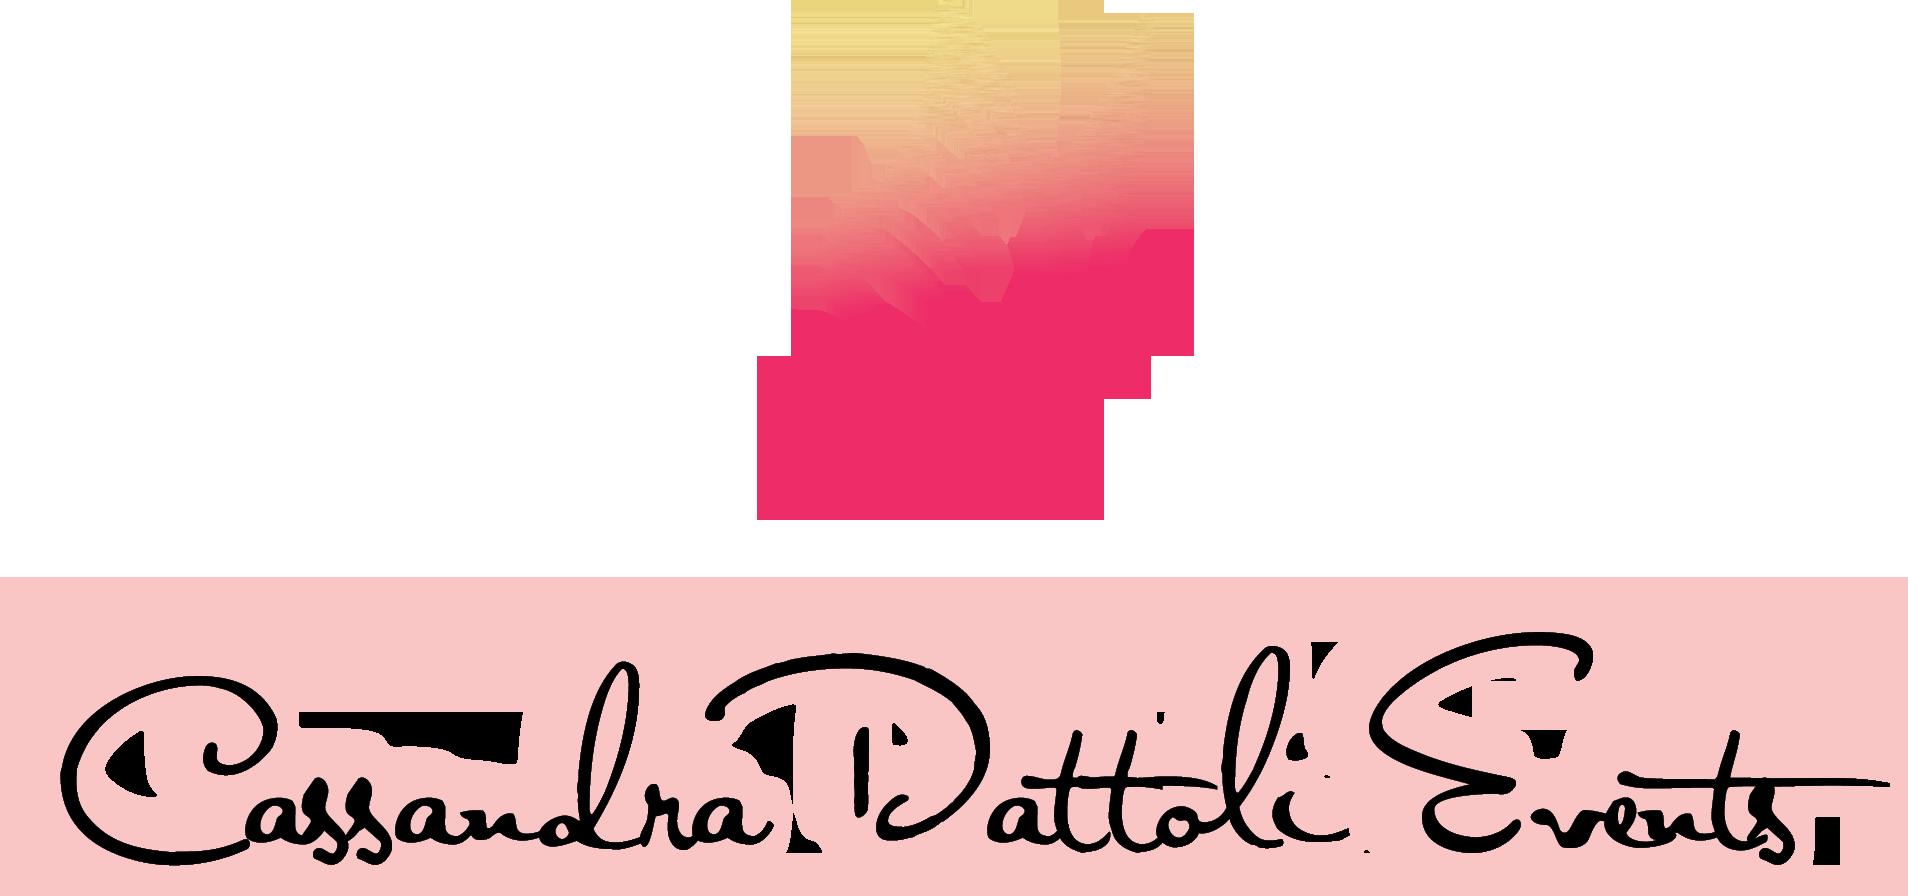 Cassandra Dattoli Events. Logo. Rebrand. Logo. Callie. Beautiful Butterfly. Love. My Heart.